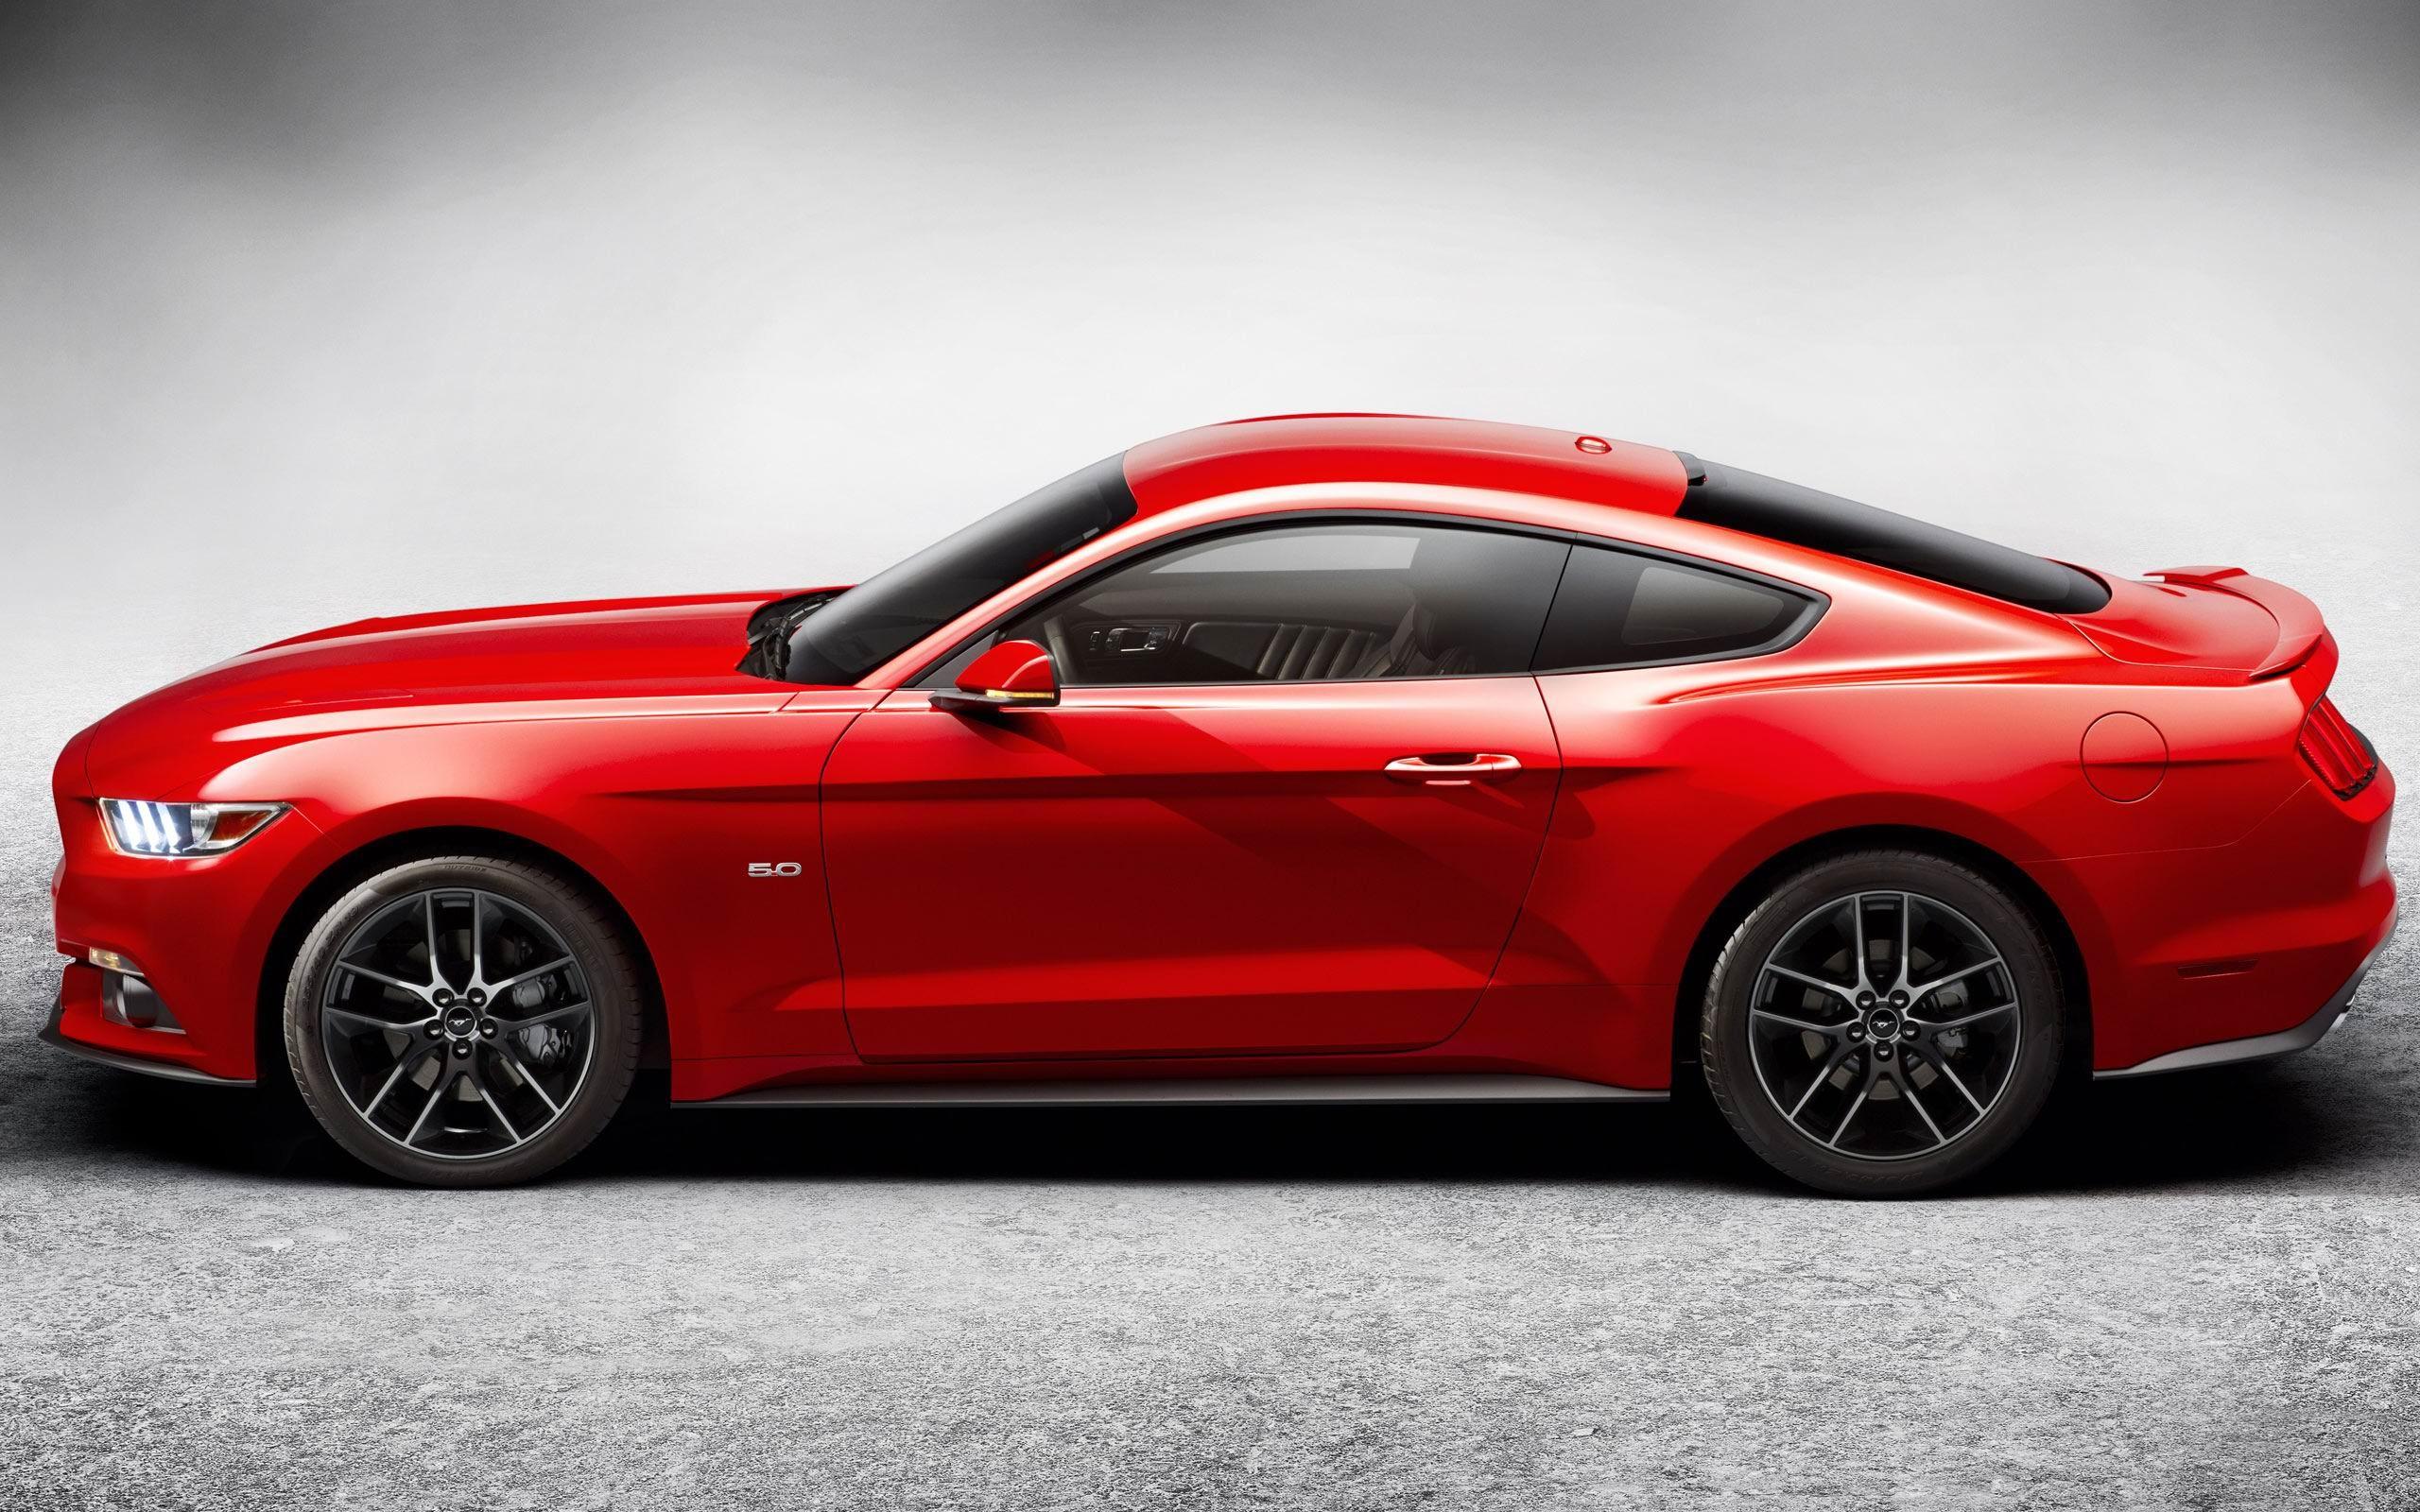 2015 Ford Mustang GT Car HD Wallpaper 12 2560x1600 2560x1600